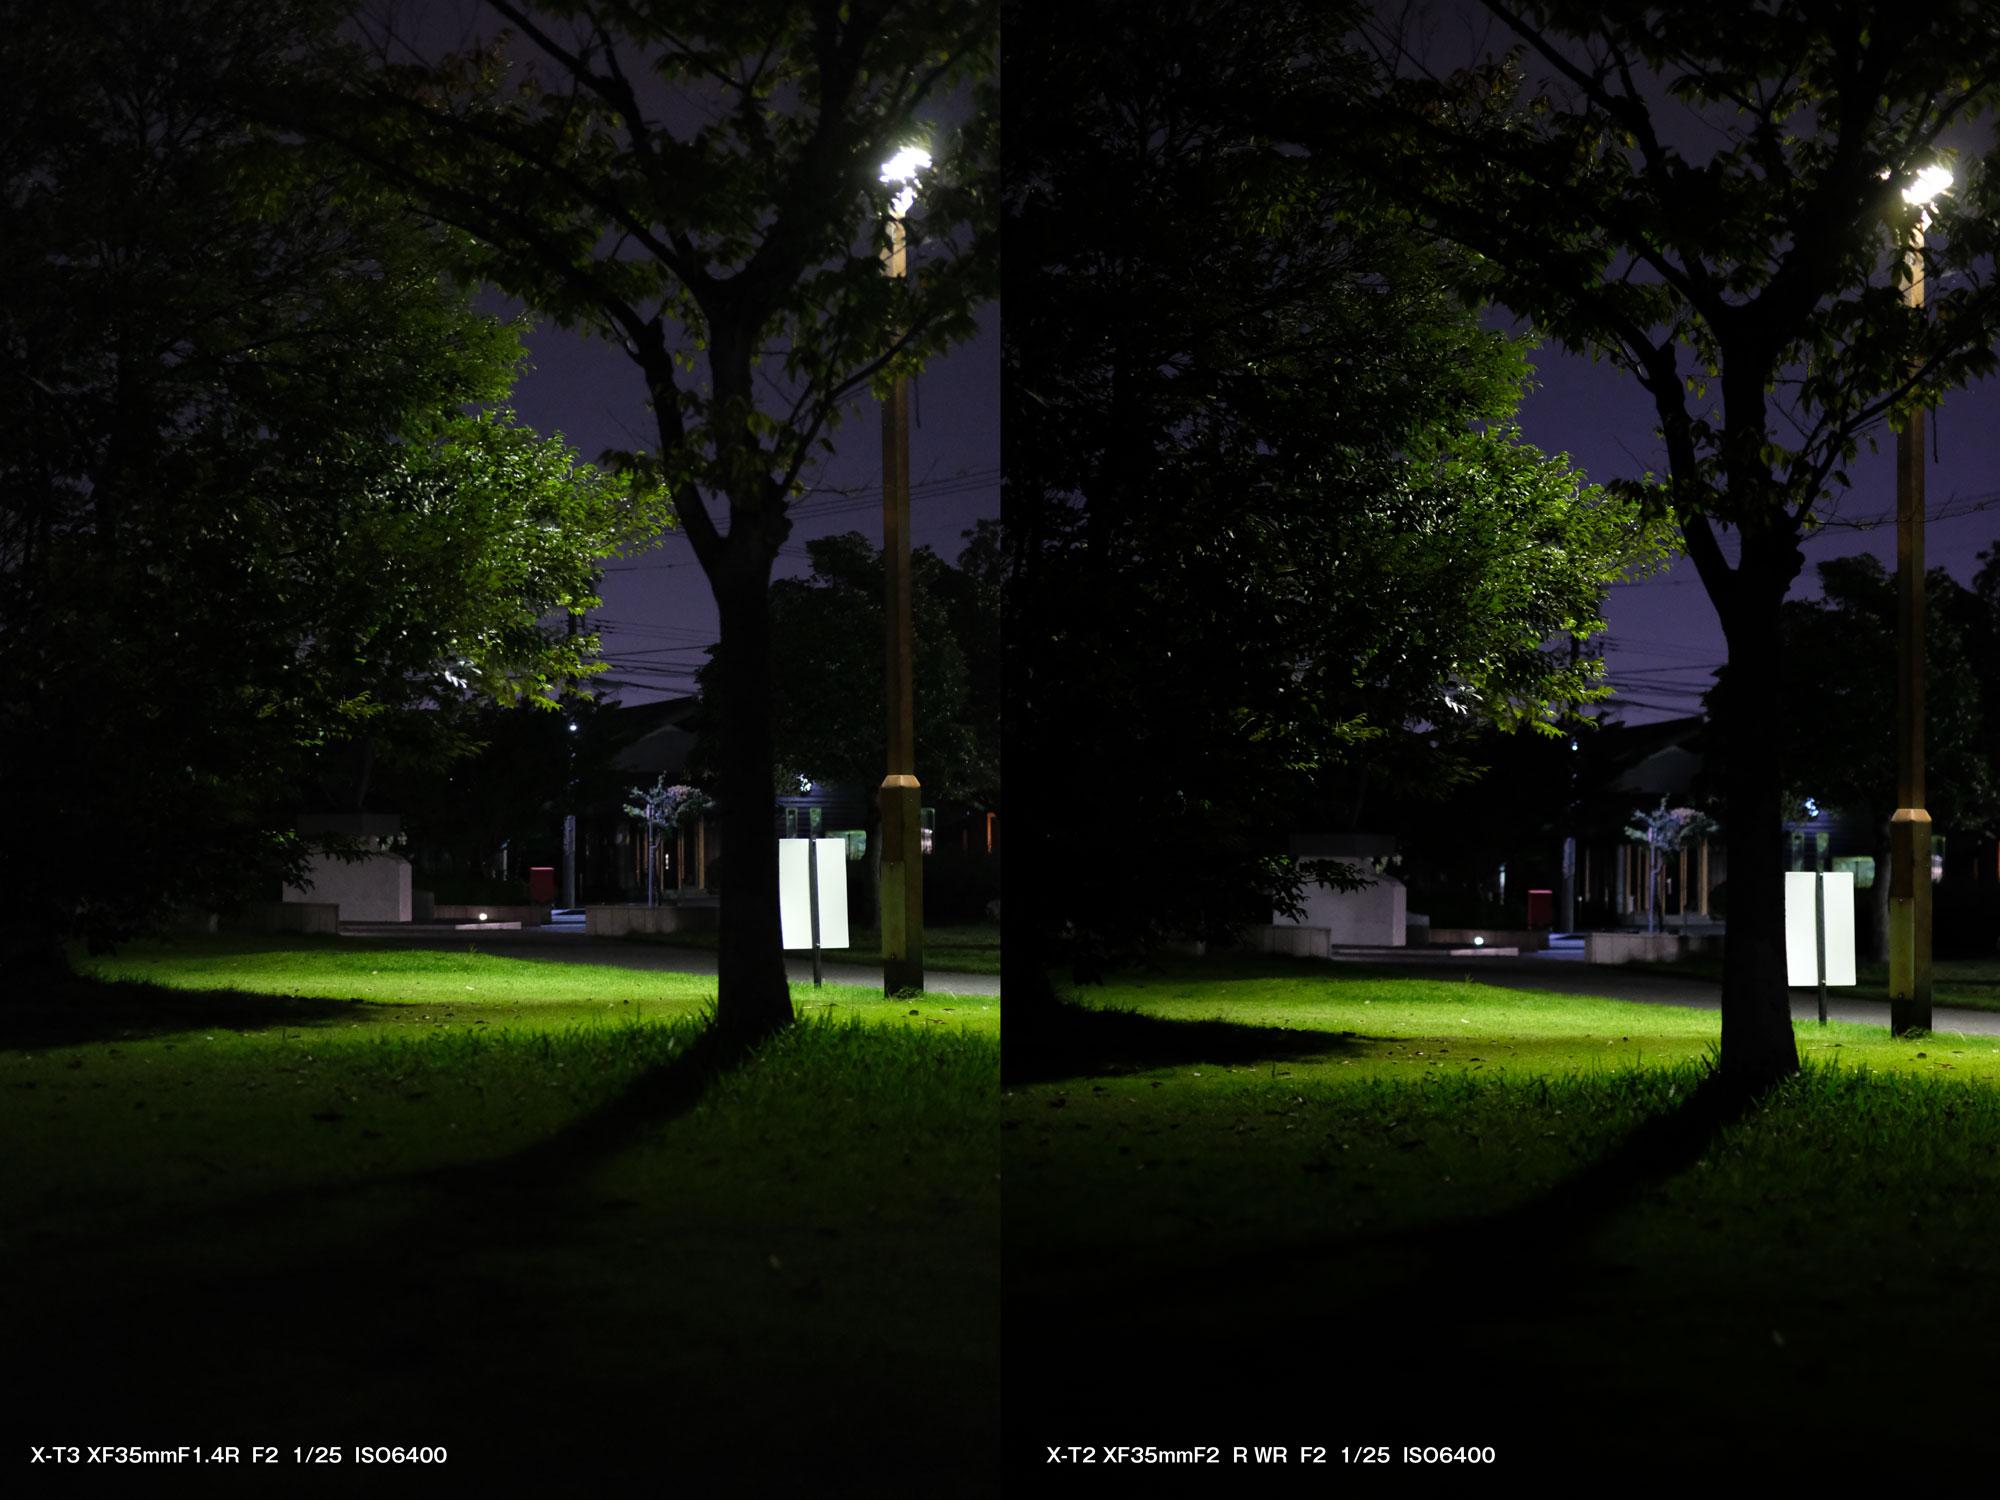 X-T3とX-T2 暗所撮影を比較